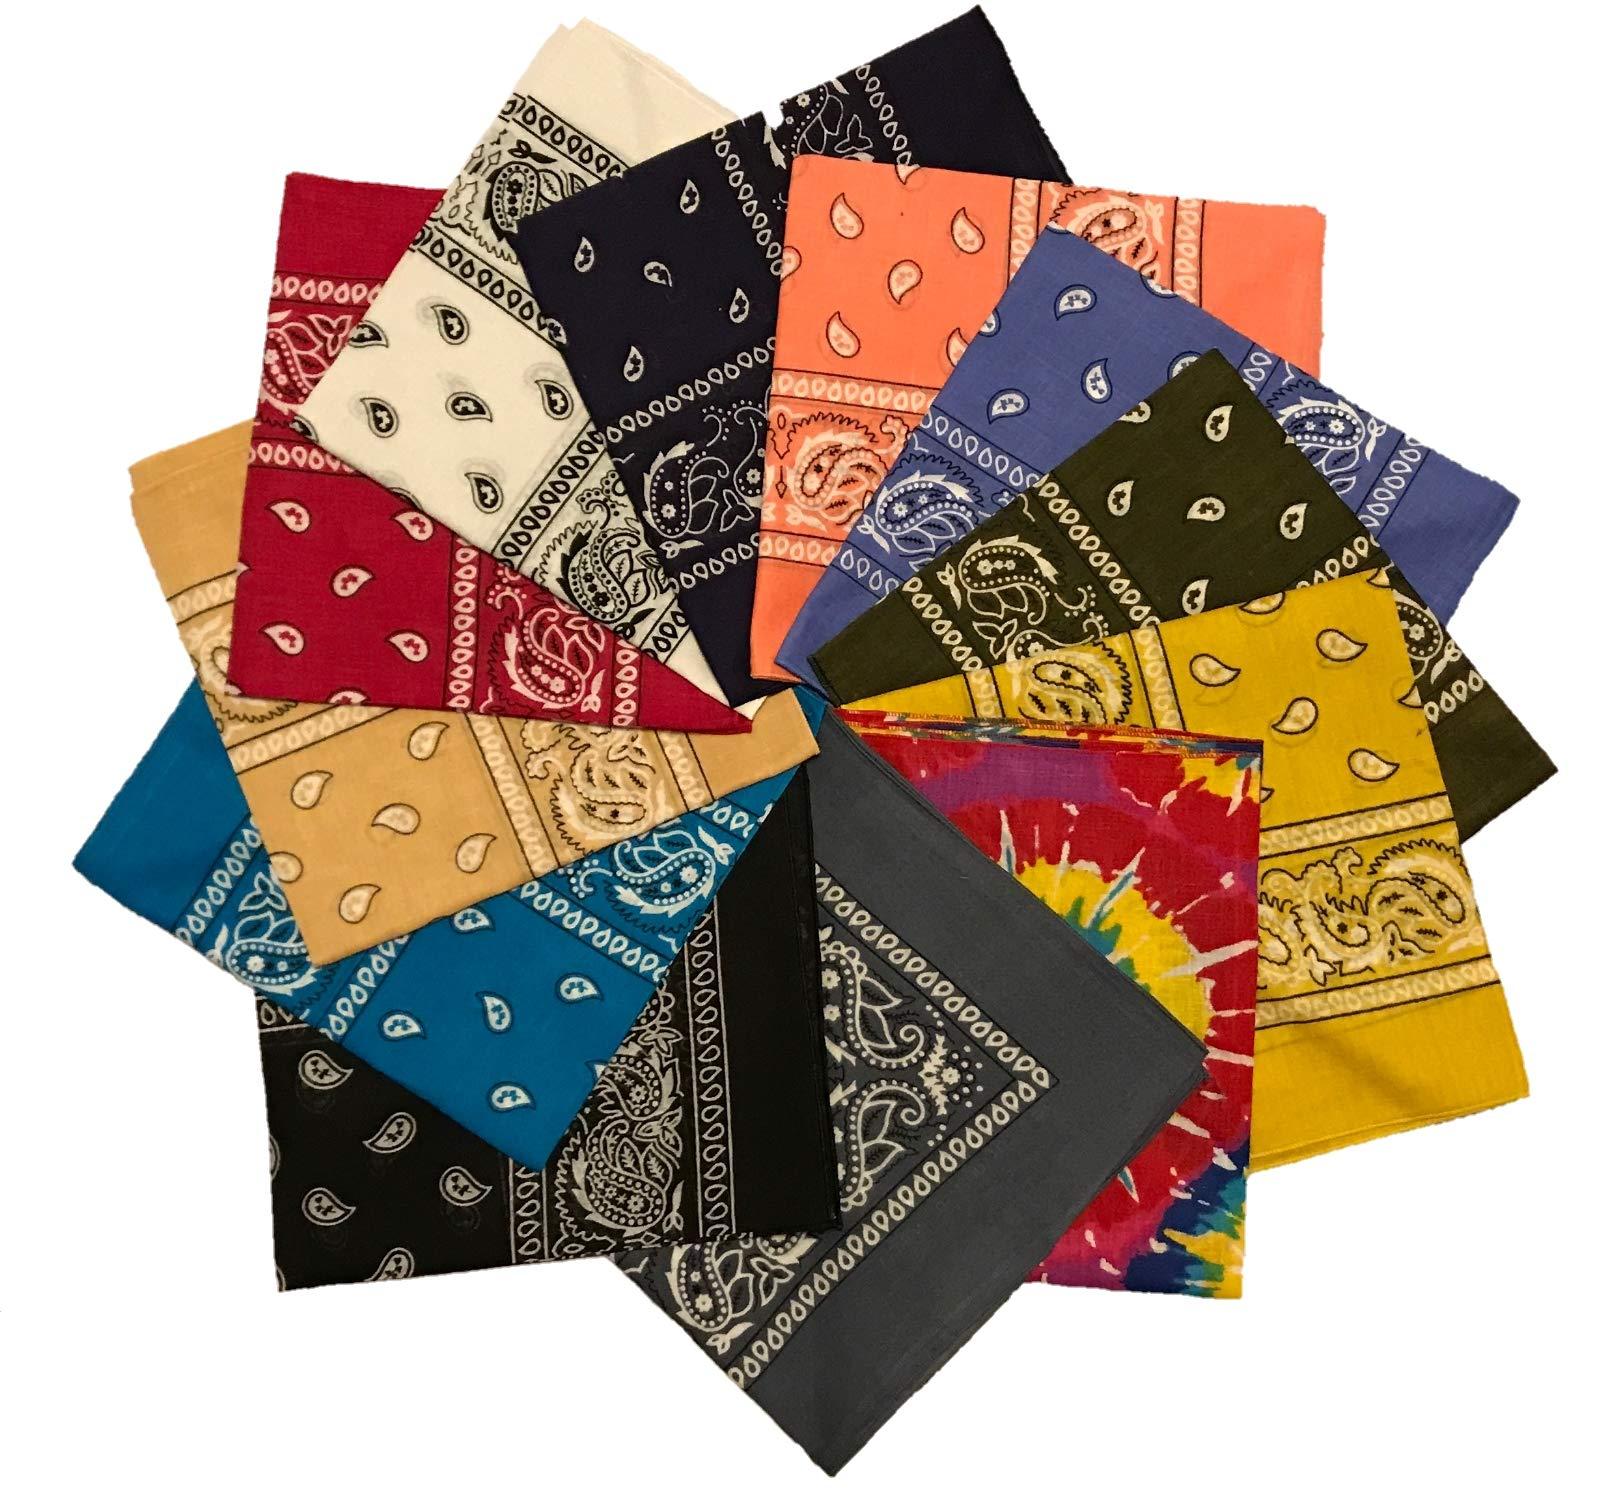 Styllion printed Bandanas - 12 pack - 100% Cotton (Assorted#4 12pcs)